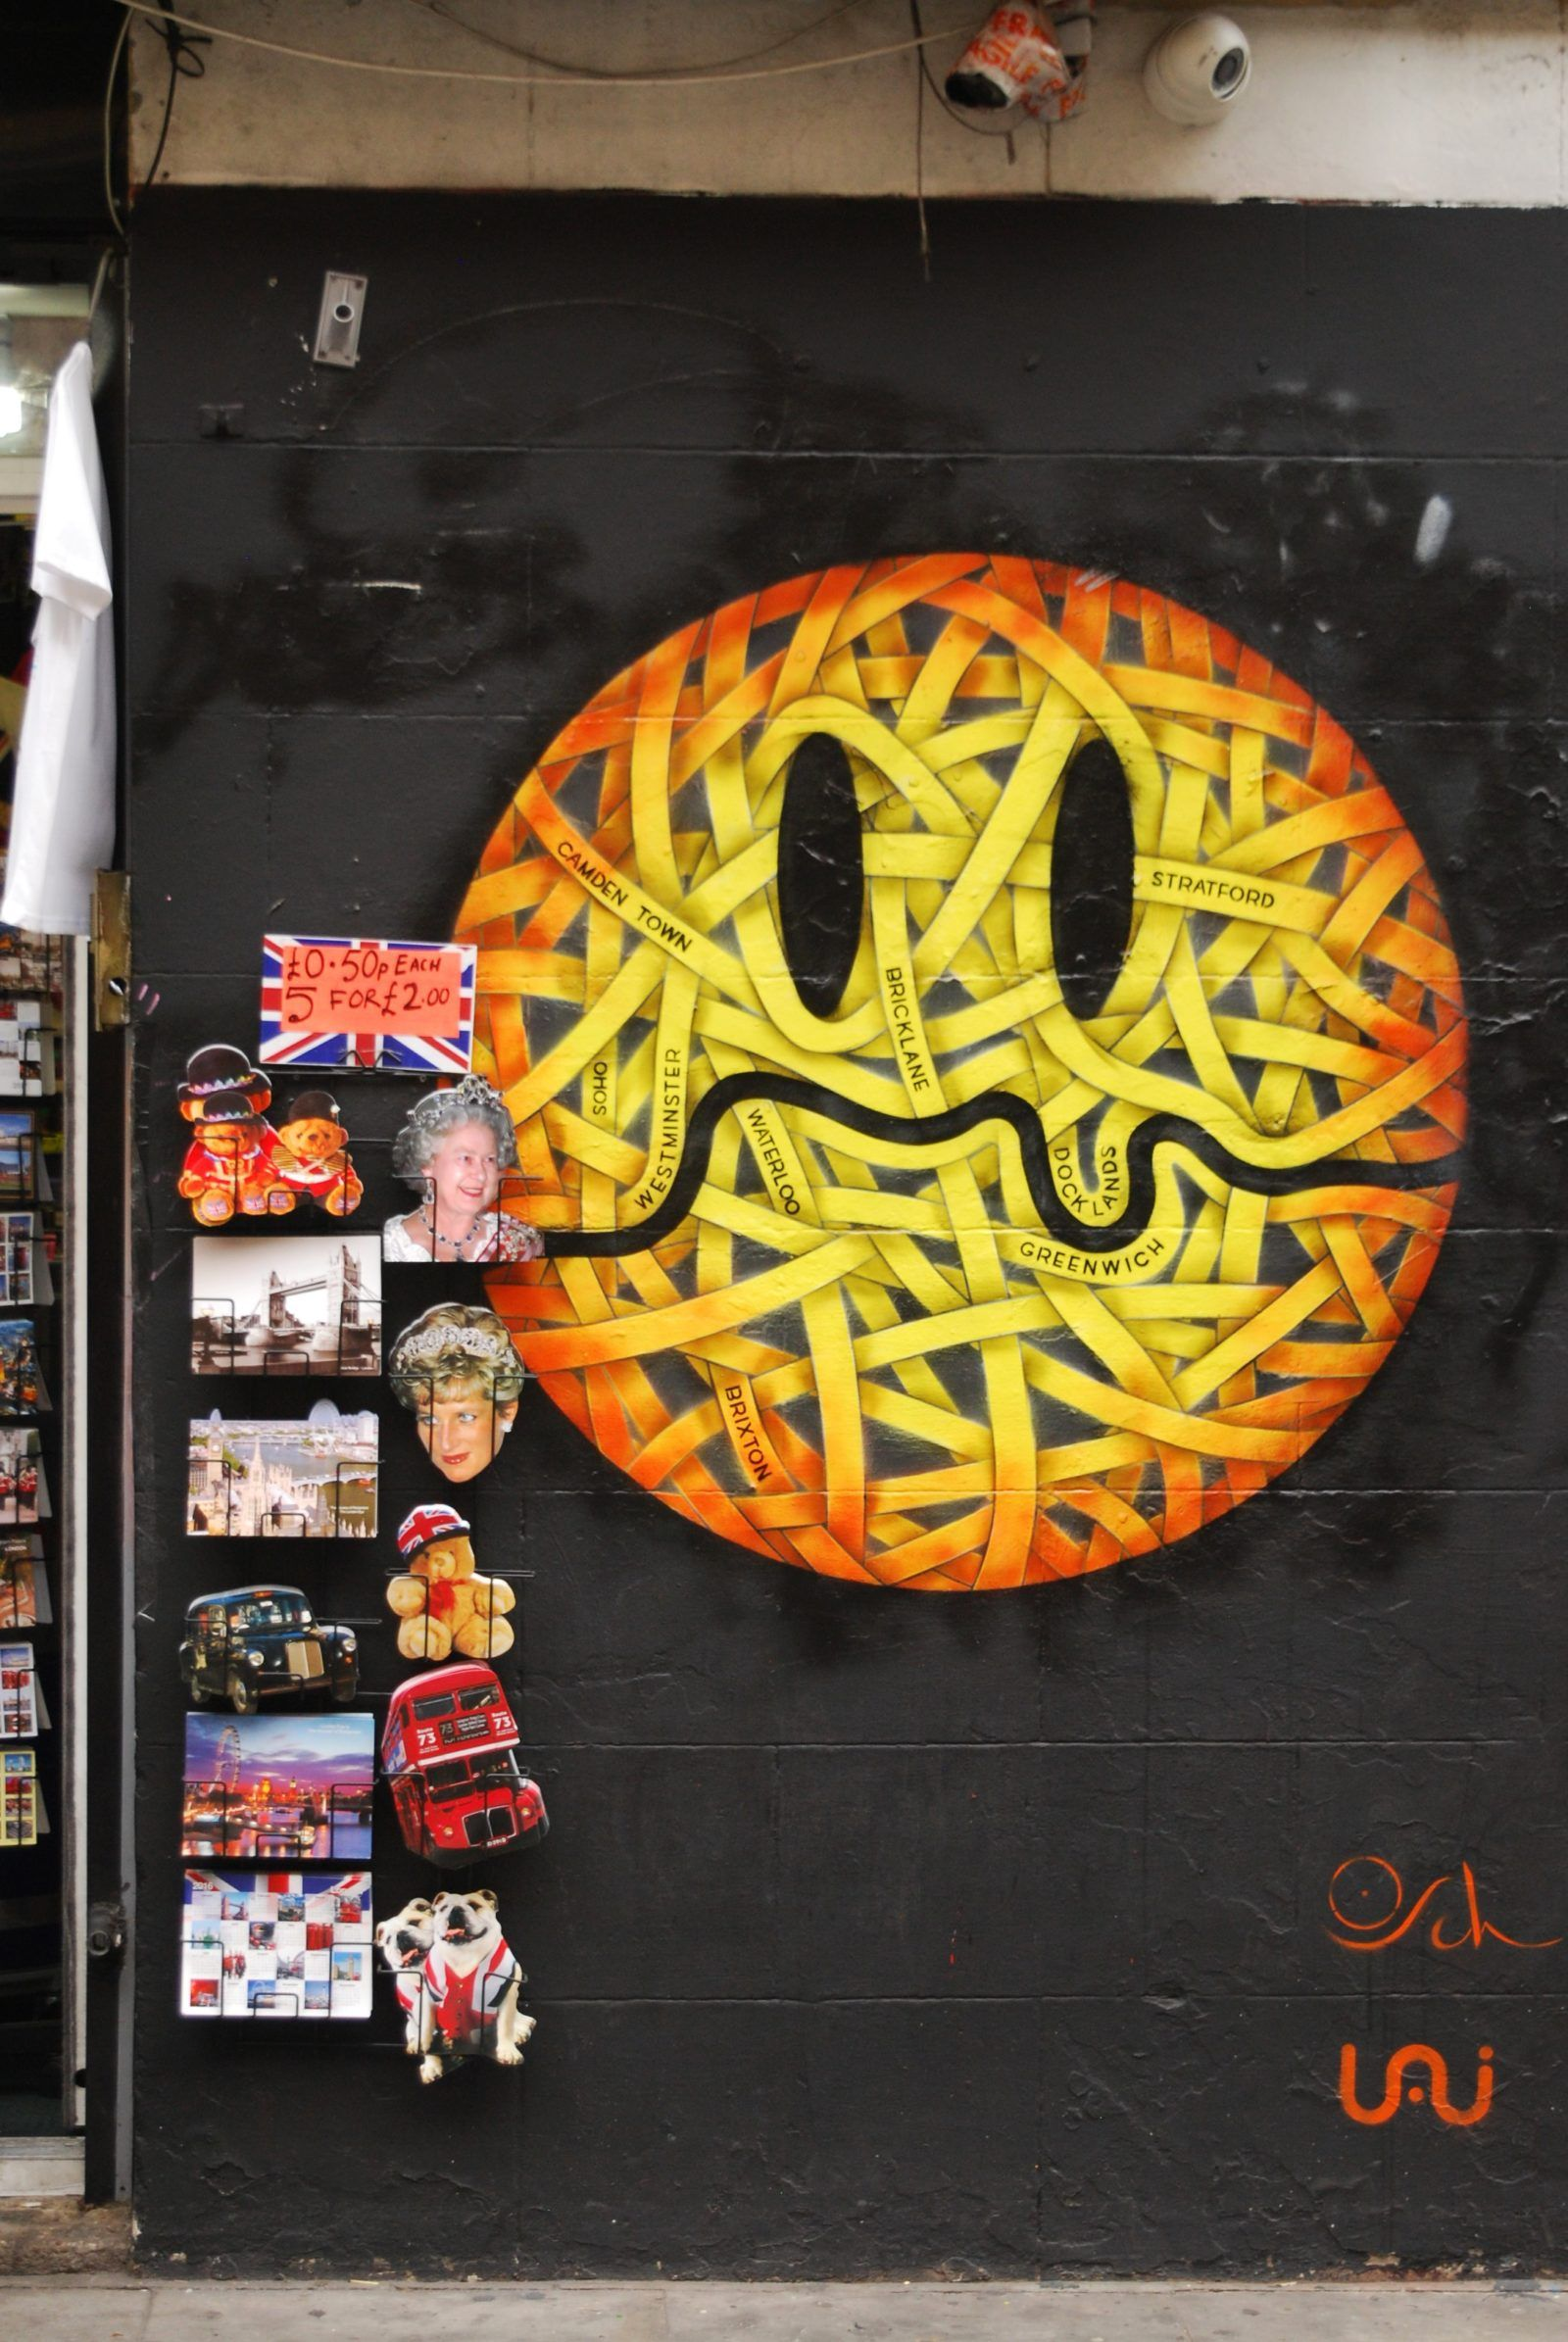 London Map Shoreditch Area: London: Shoreditch Street Art Tour